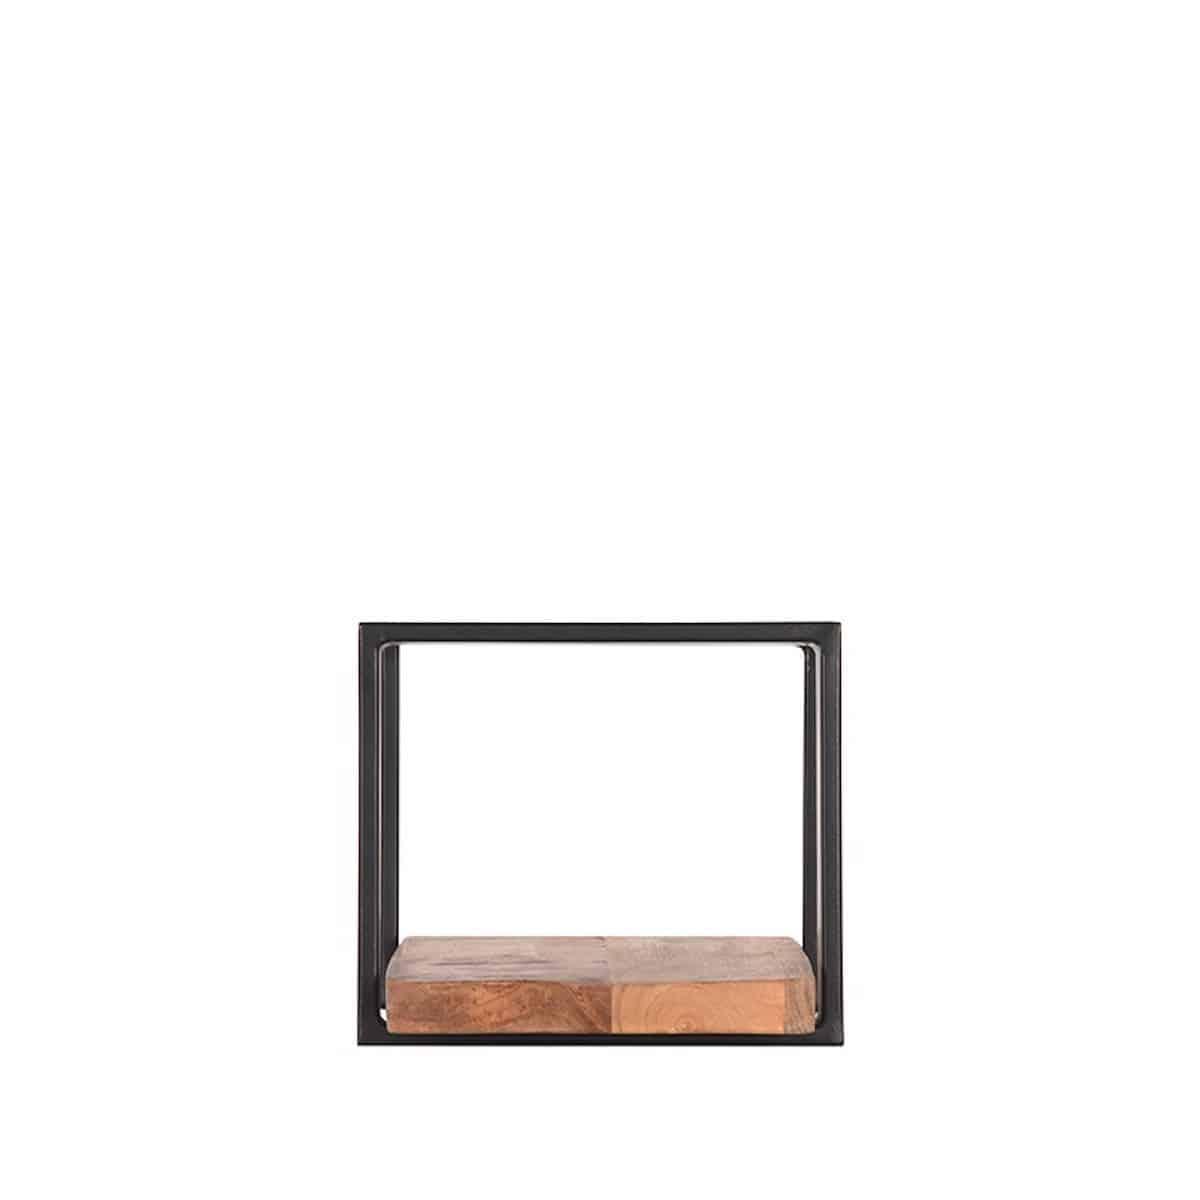 Wandplank Zwart Metaal.Wandplank Zwart Wandplank 100 Cm